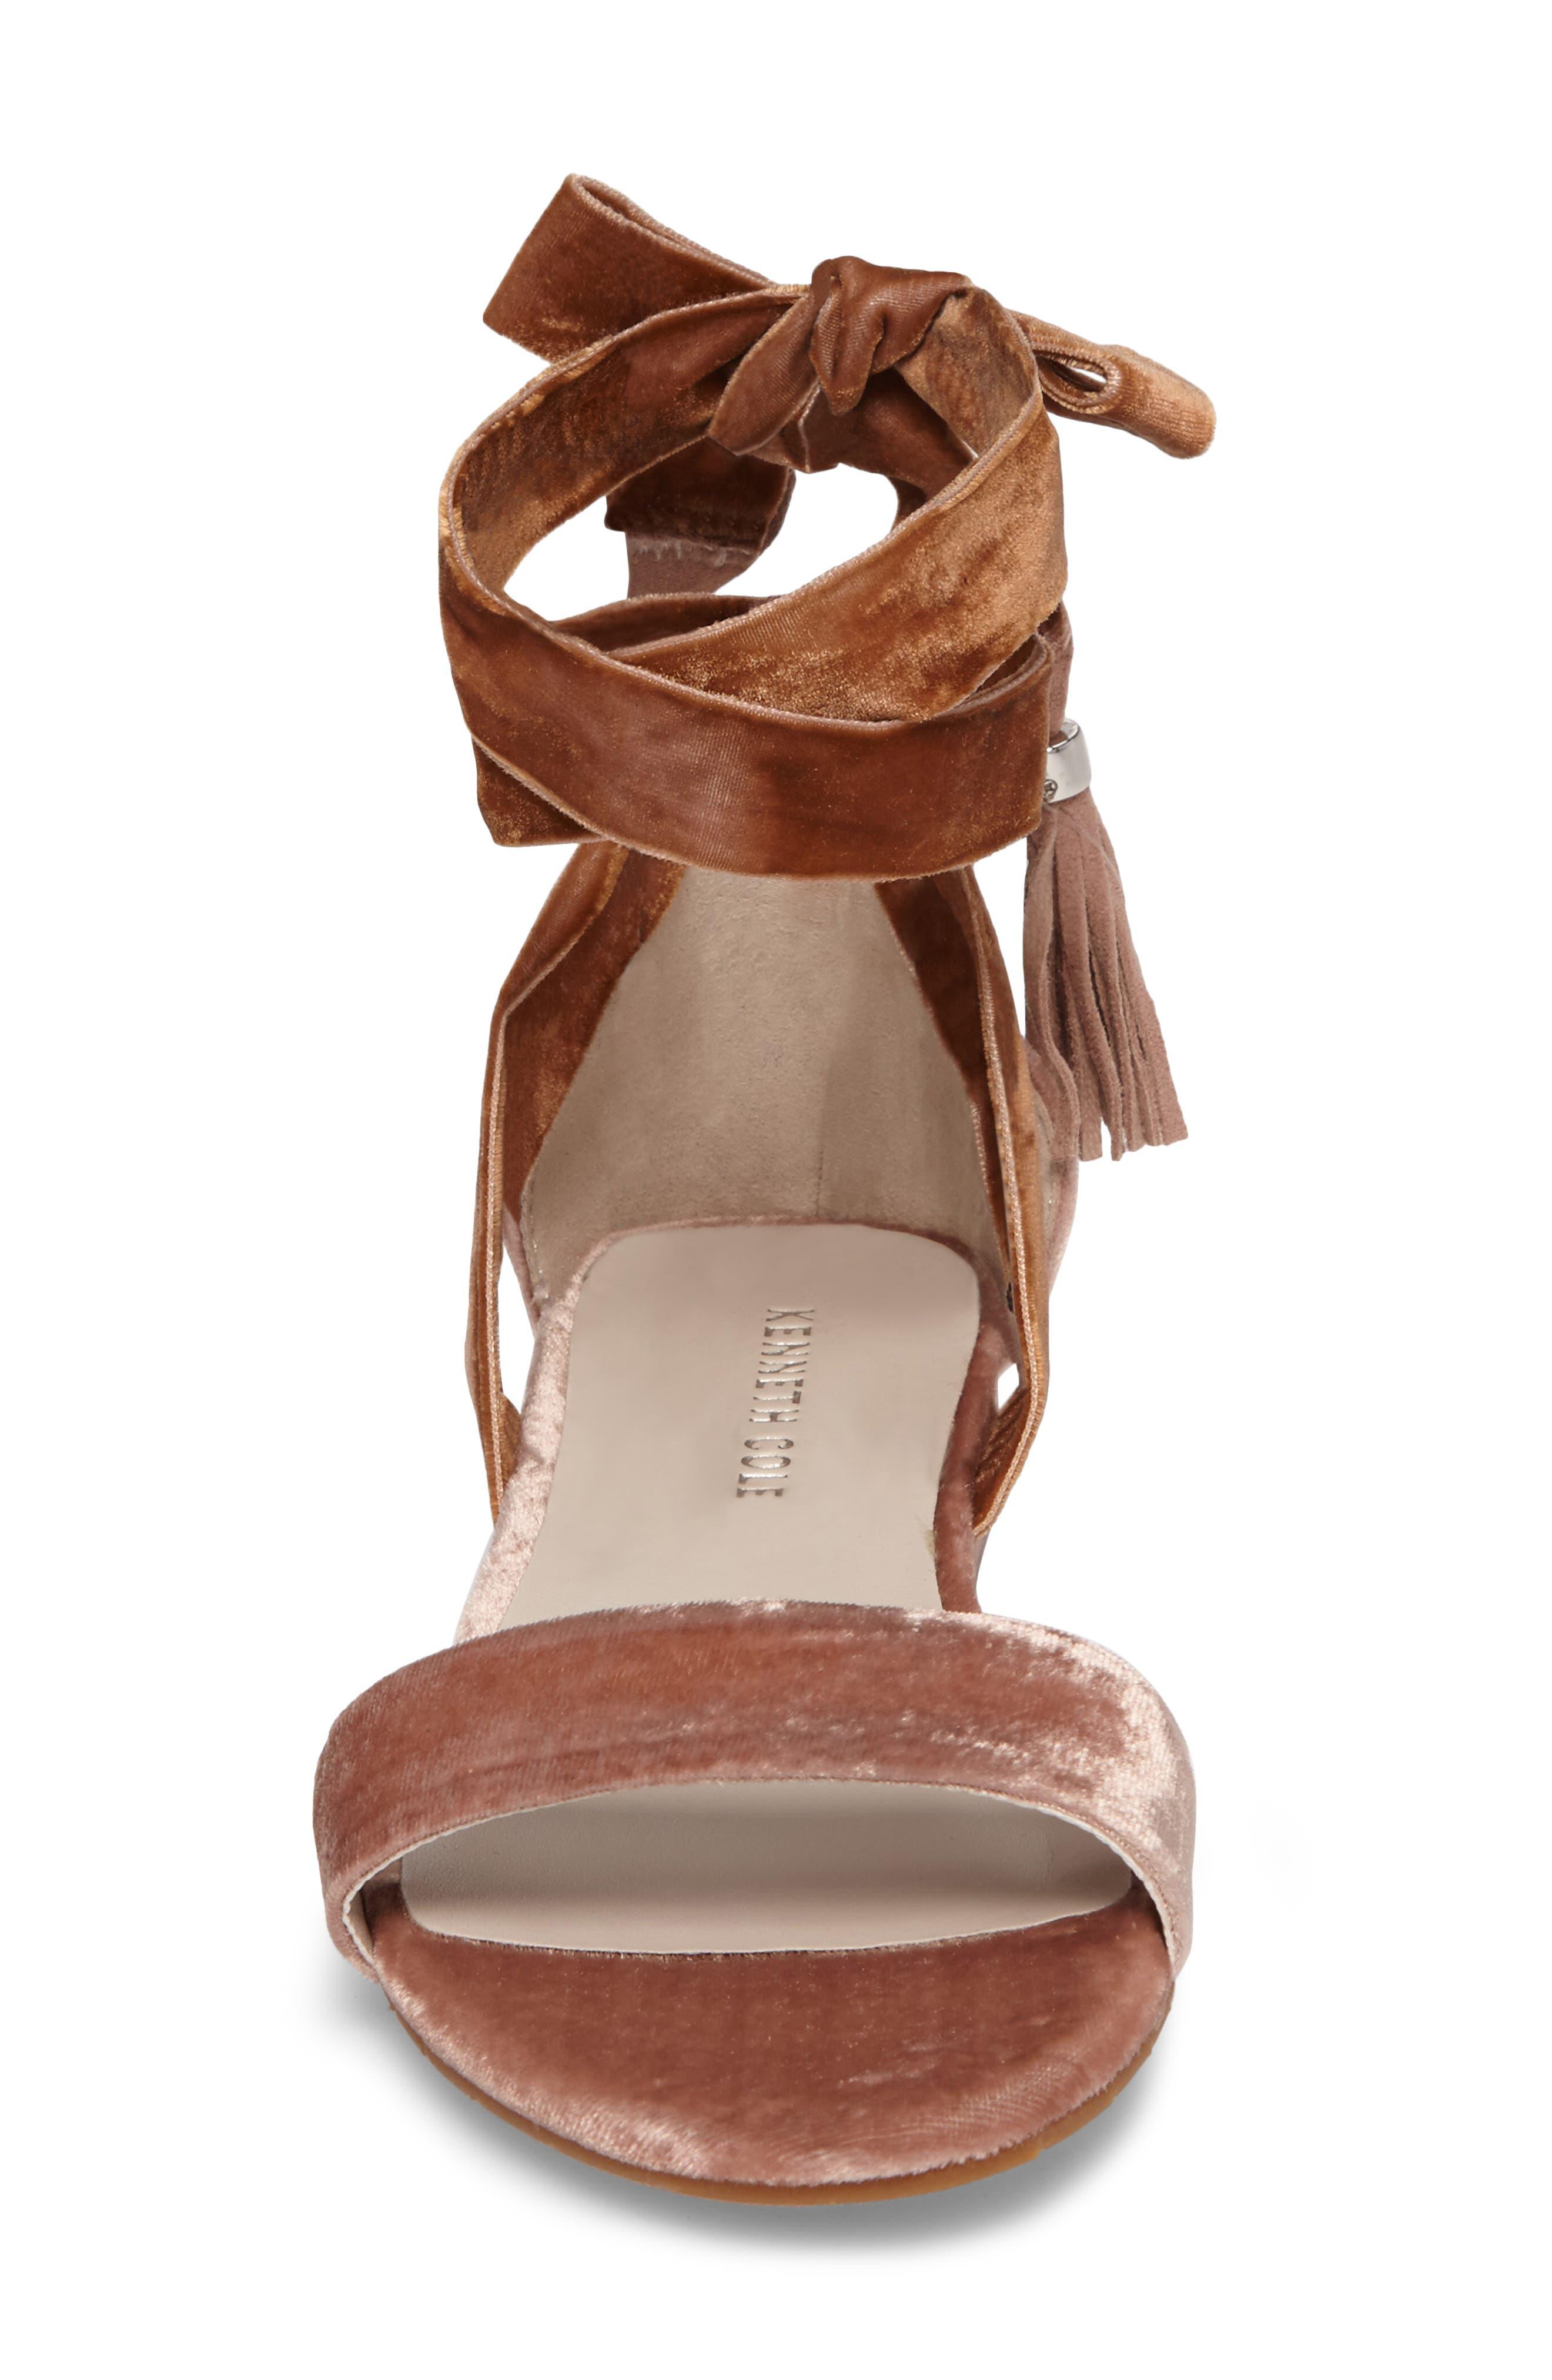 Valen Tassel Lace-Up Sandal,                             Alternate thumbnail 47, color,